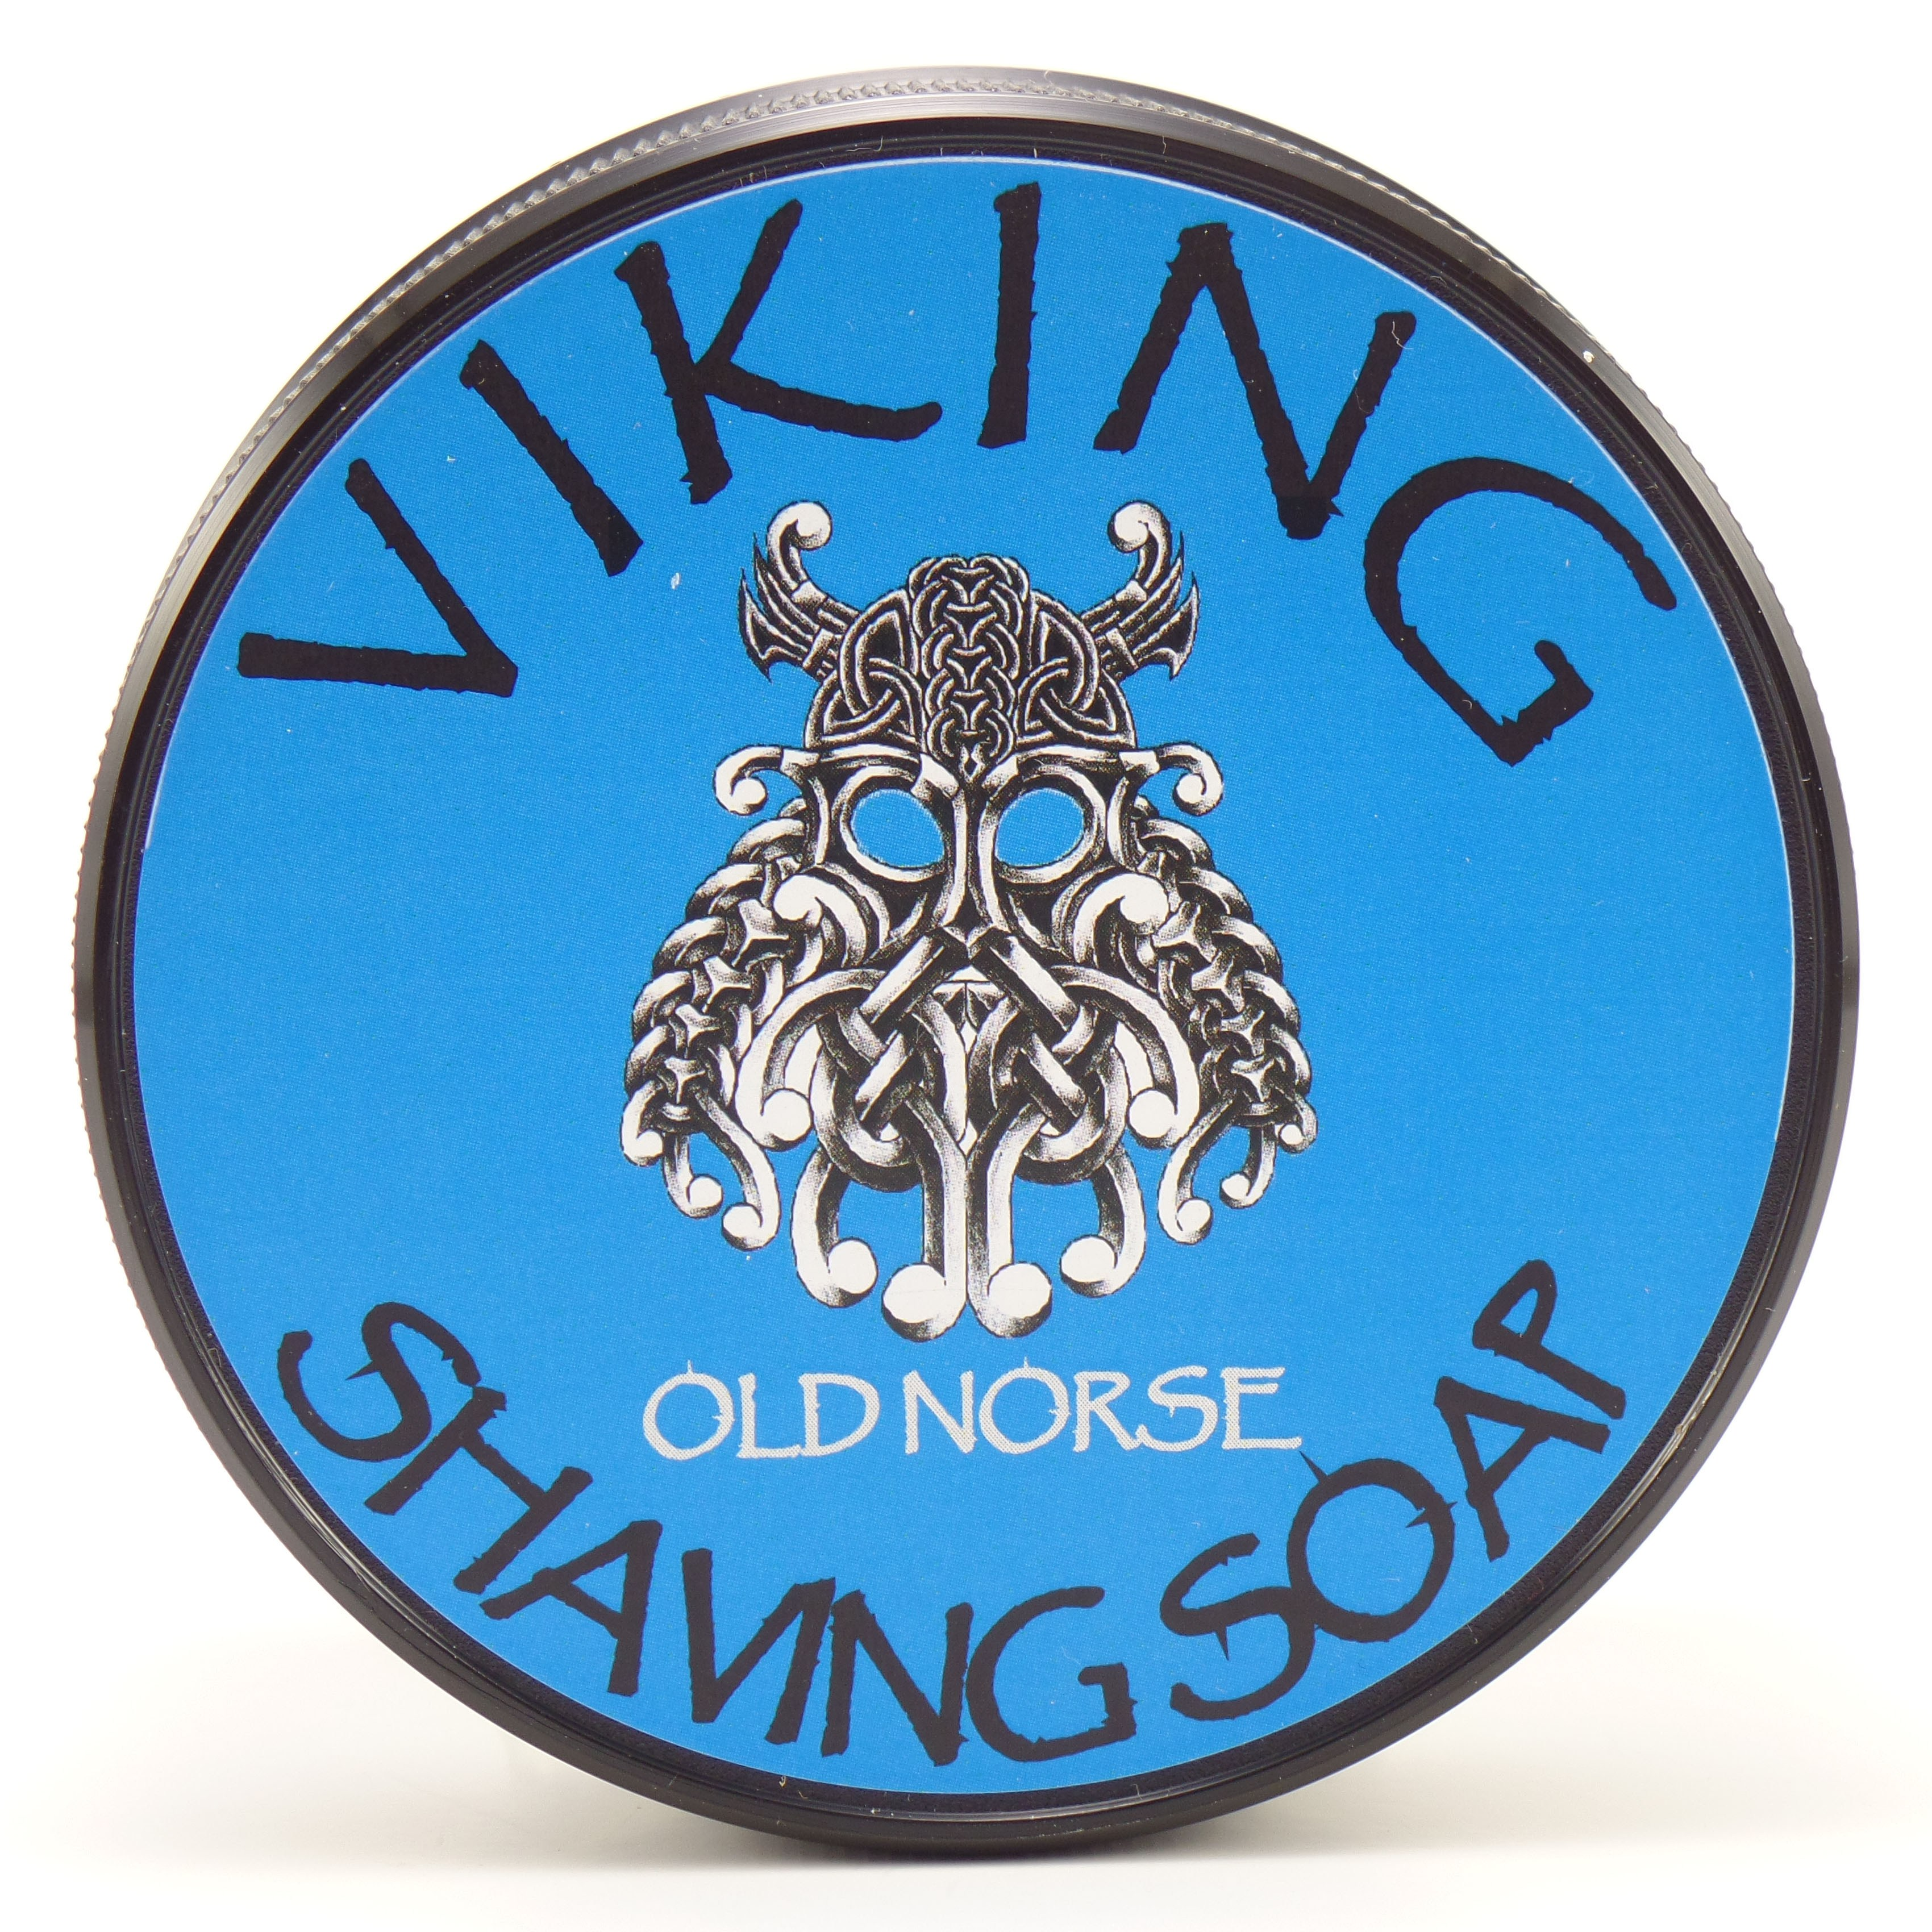 Viking Shaving Soap - Old Norse - Soap image